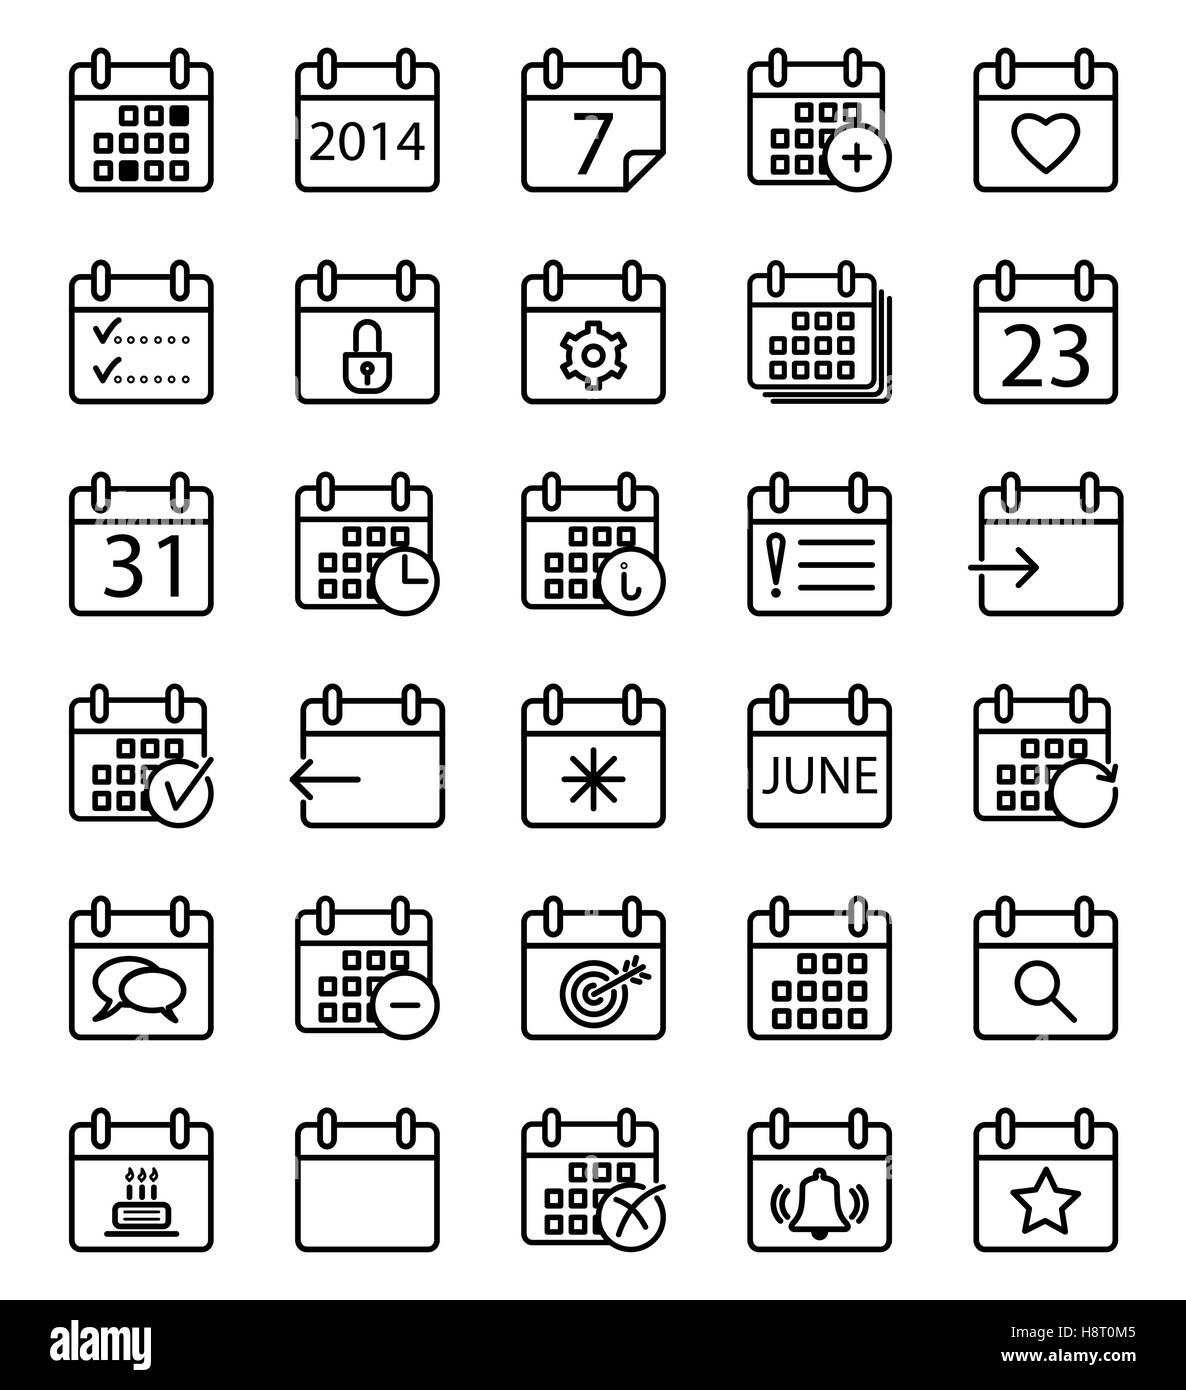 Calendar stroke icons set. Vector illustration. Stock Vector